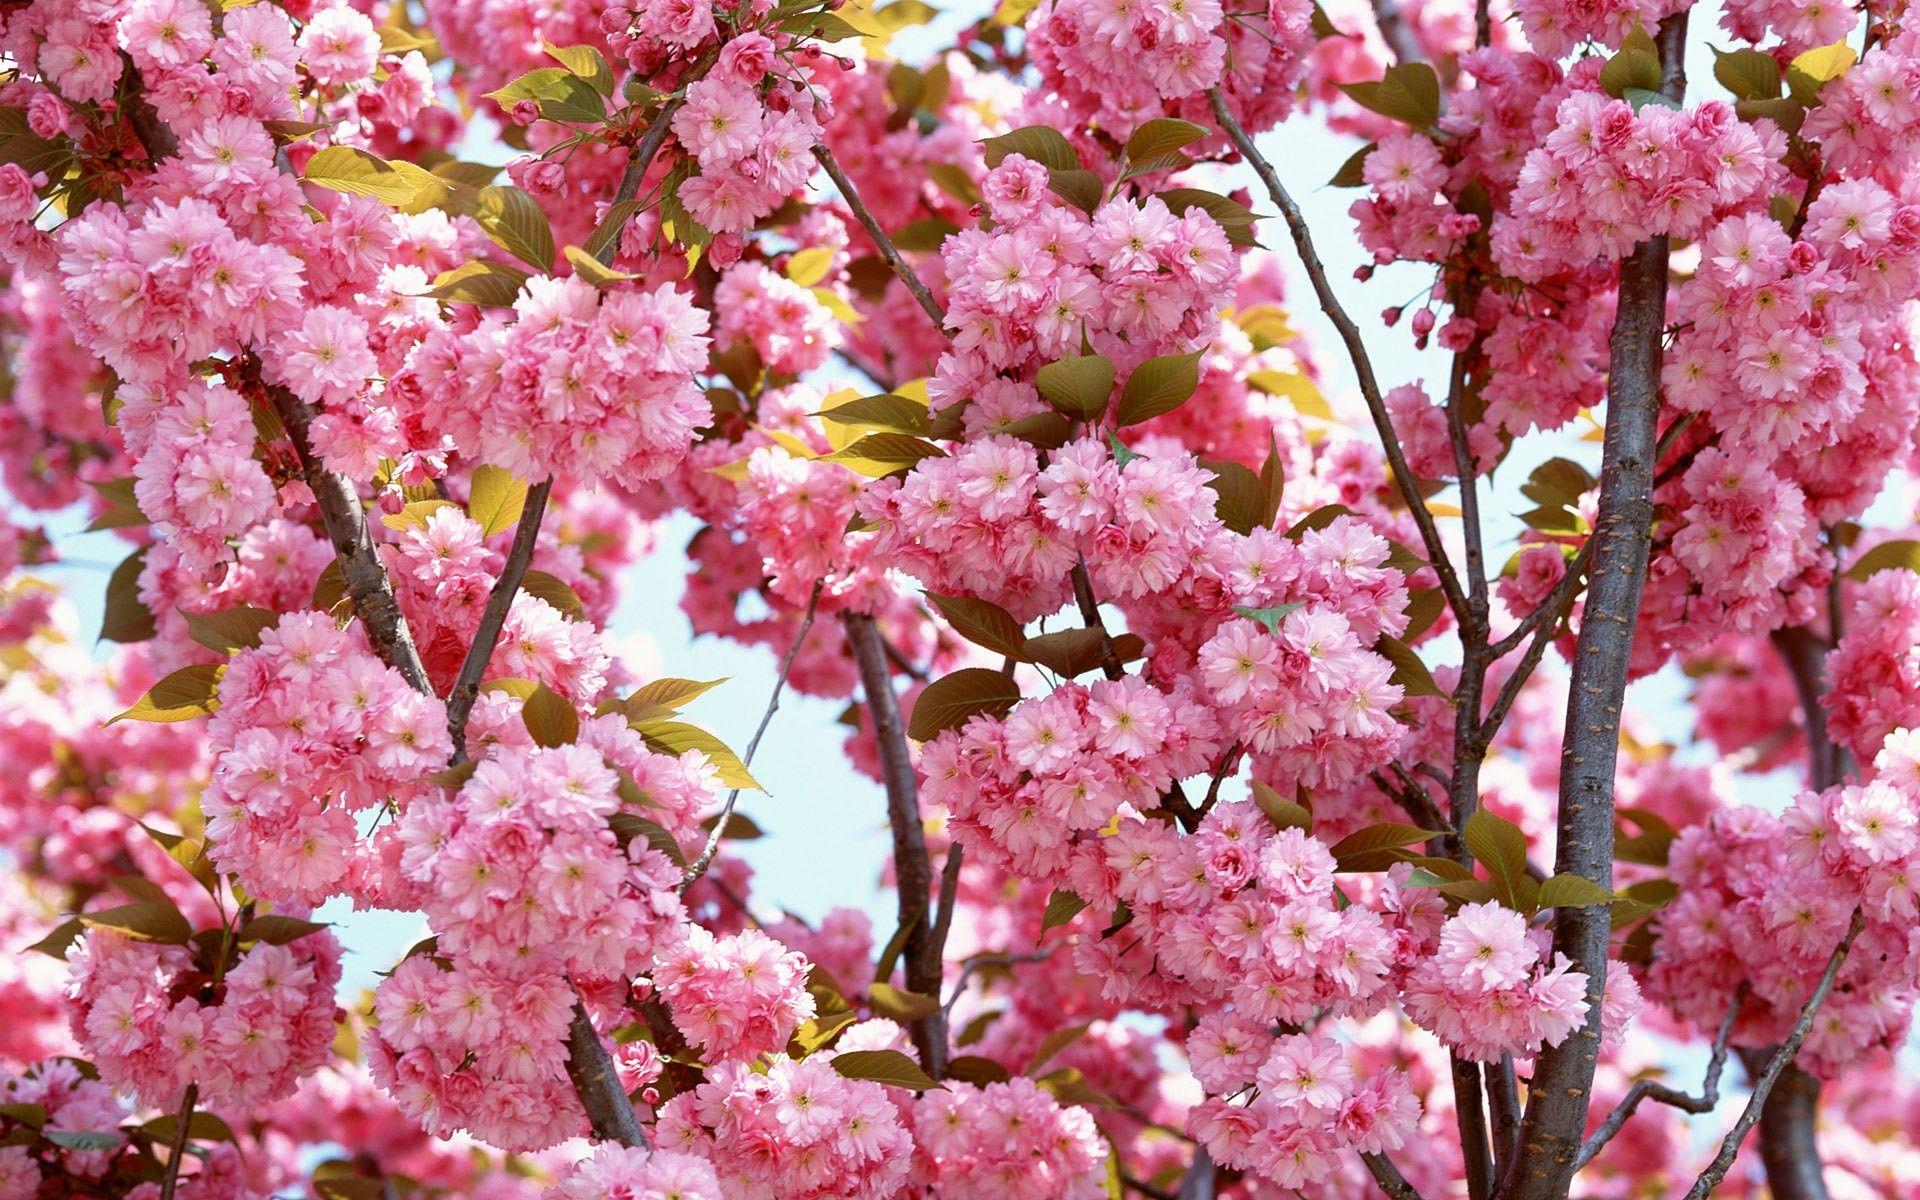 Beautiful Wallpaper Night Cherry Blossom - fbc3e44cba5b1213f3563d3daba37edf  Perfect Image Reference.jpg